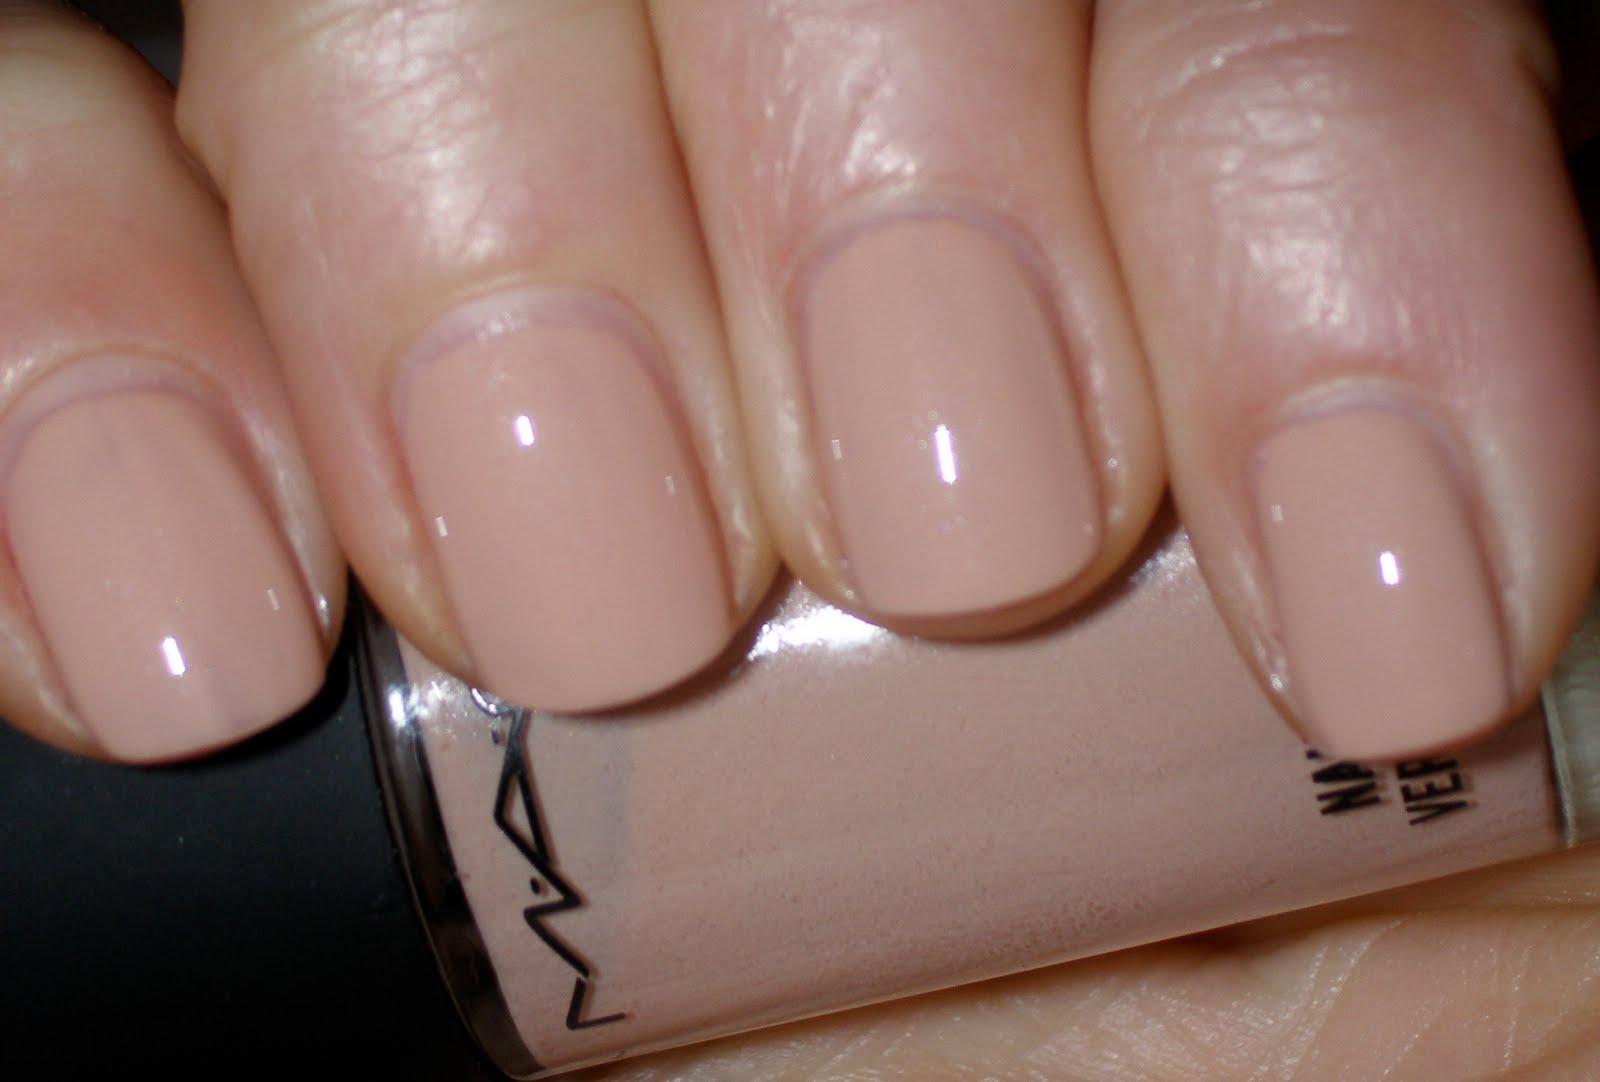 nude-nail-polish-colors-image